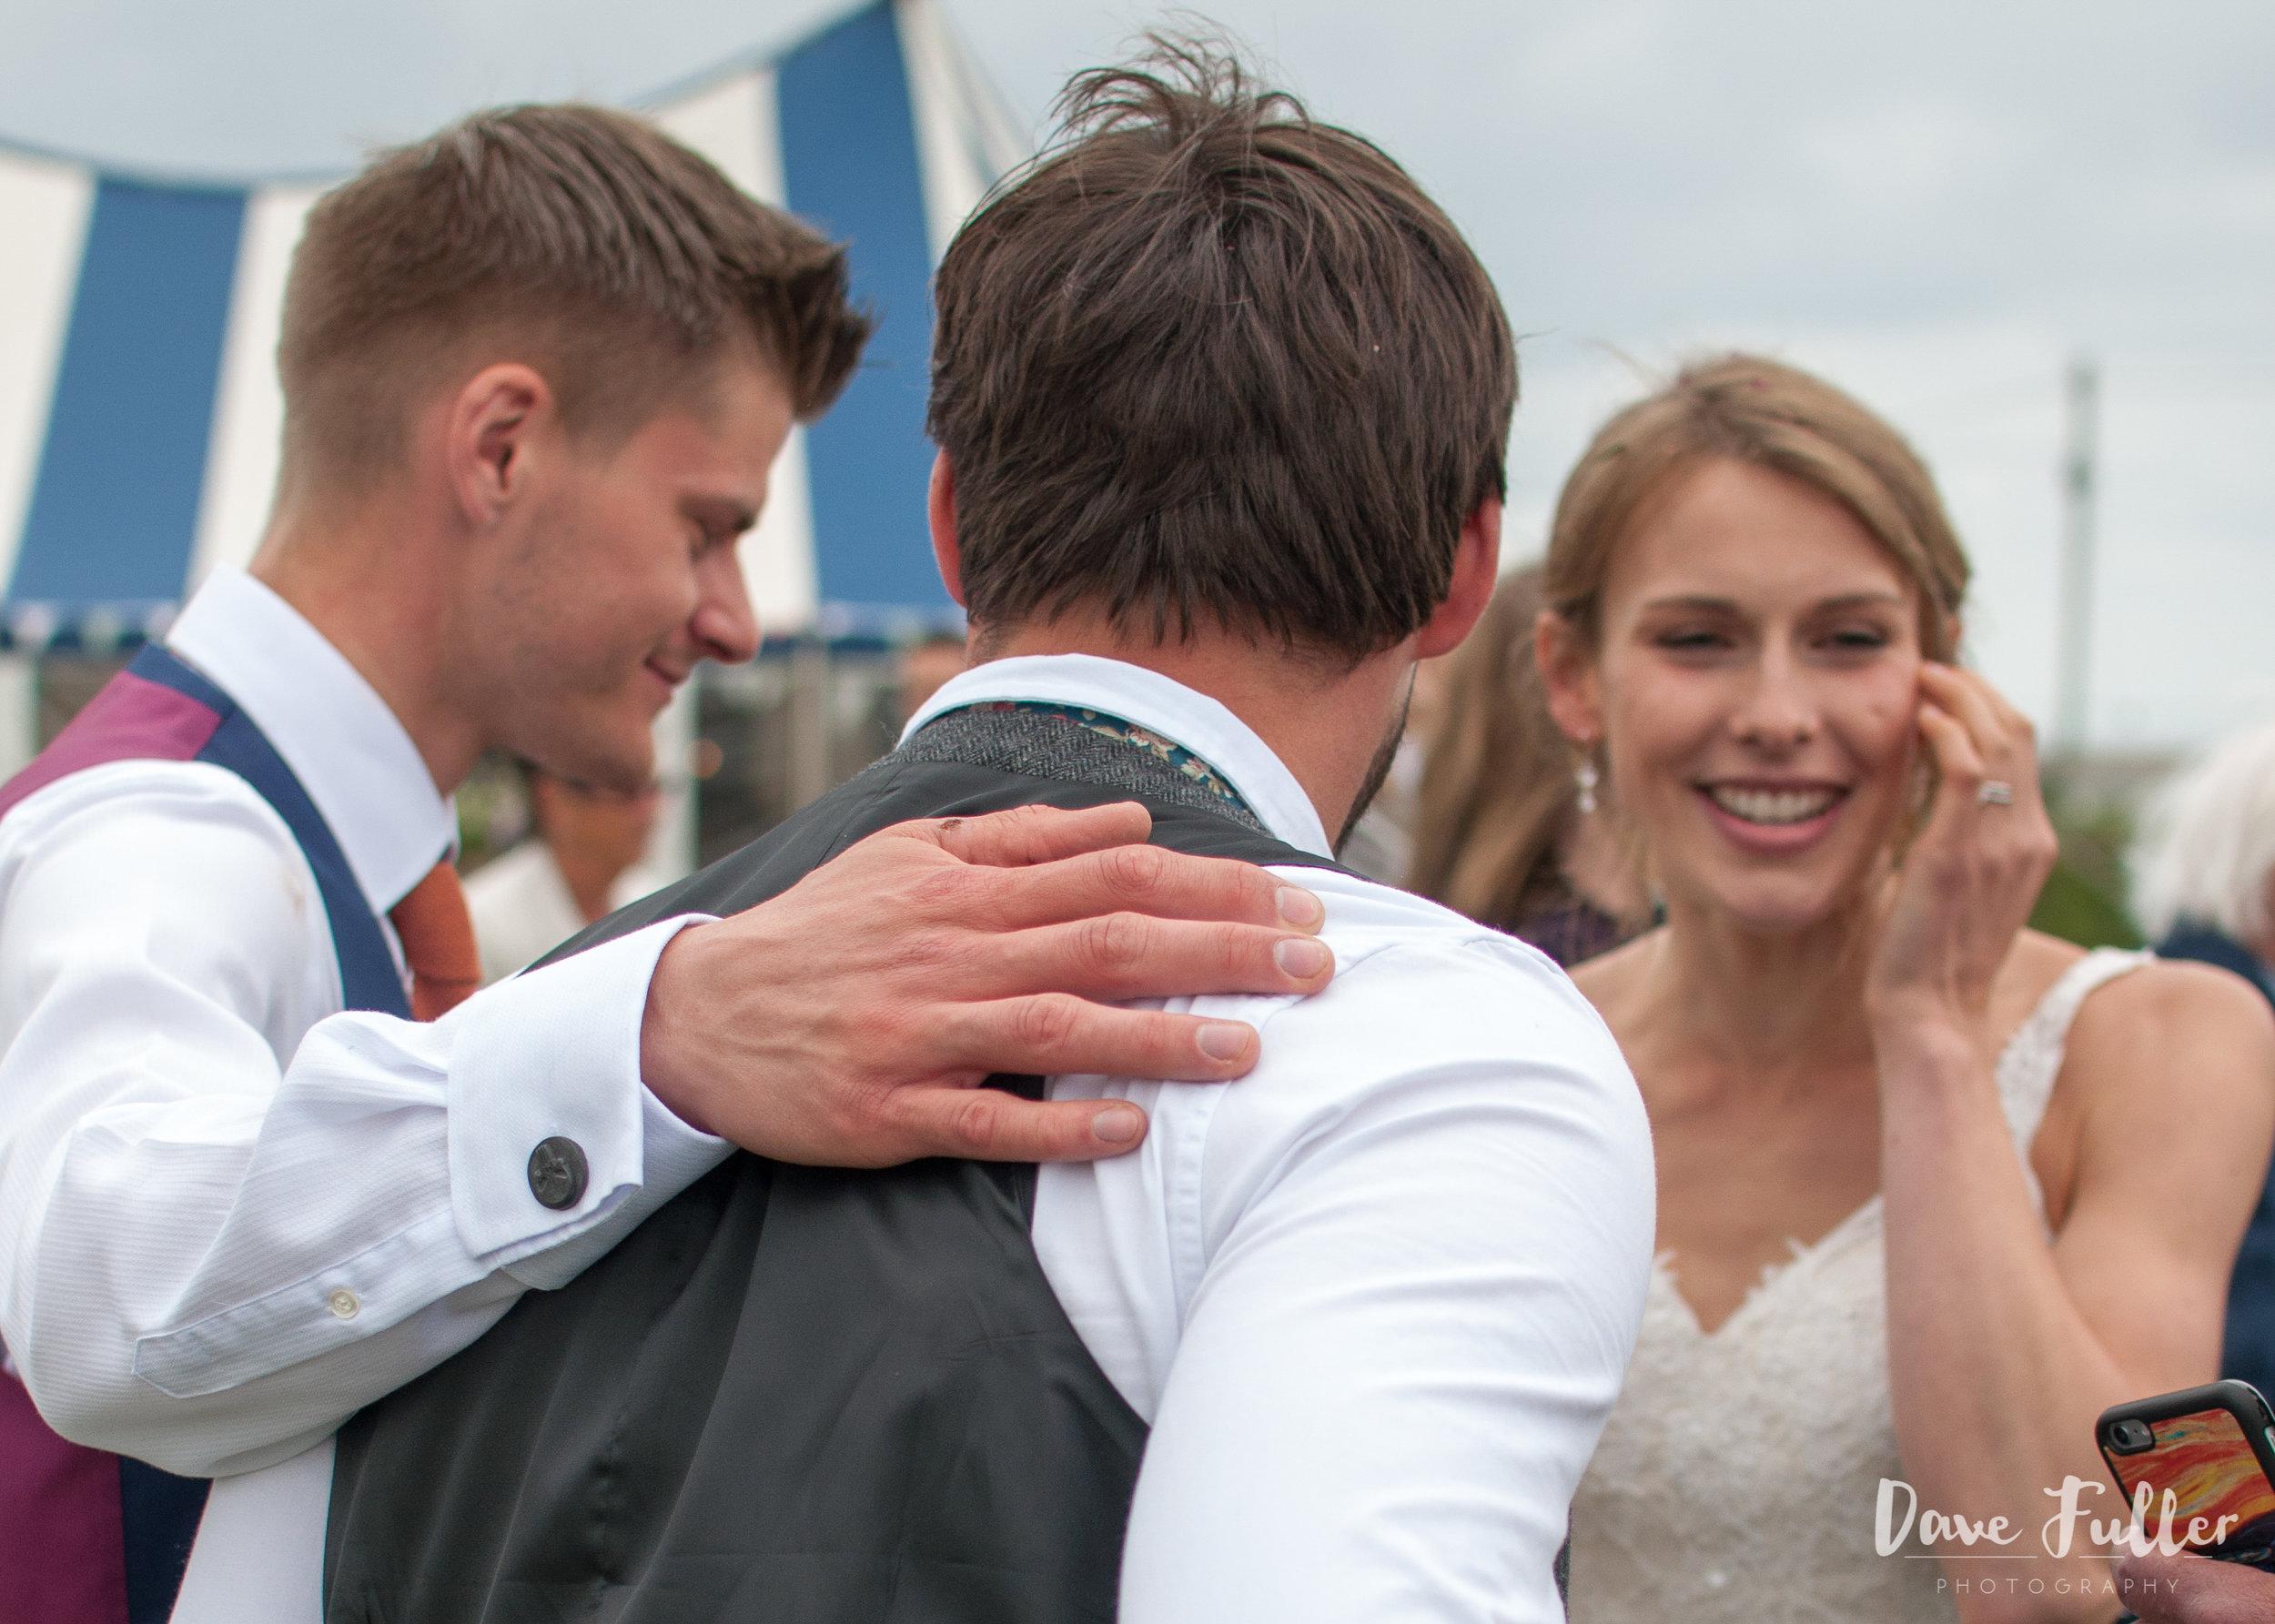 Nottingham Wedding Photographer - ward-0548.jpg